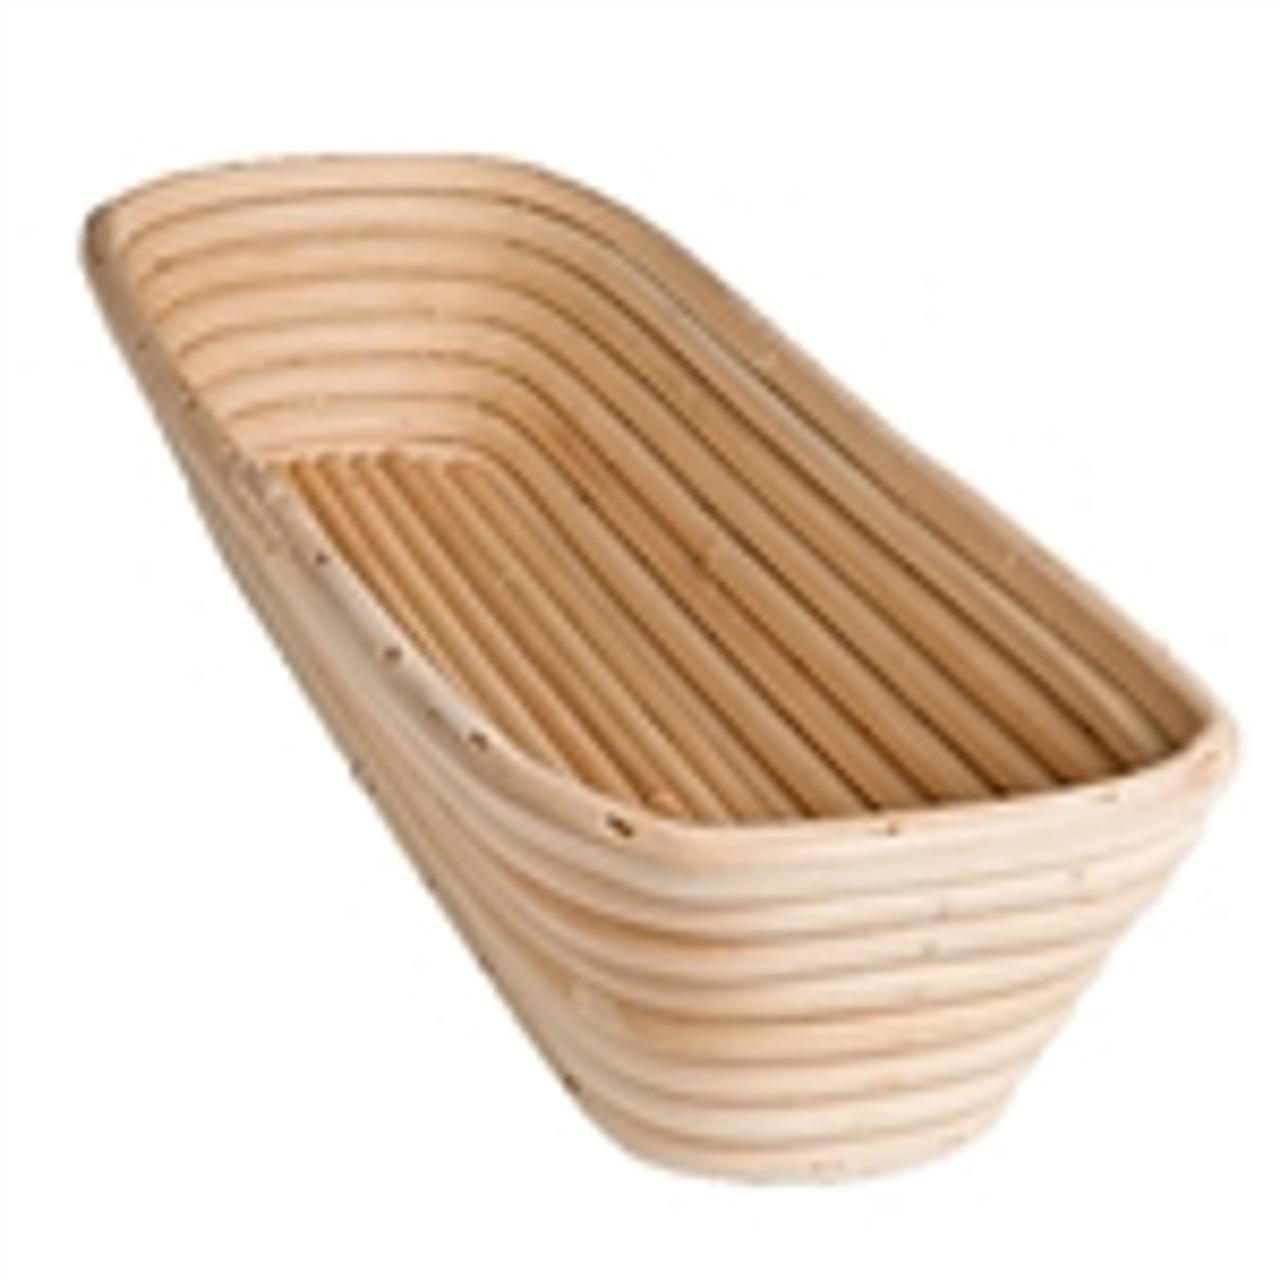 "Banneton Proofing Basket, Rectangular, 15"" x 5½"